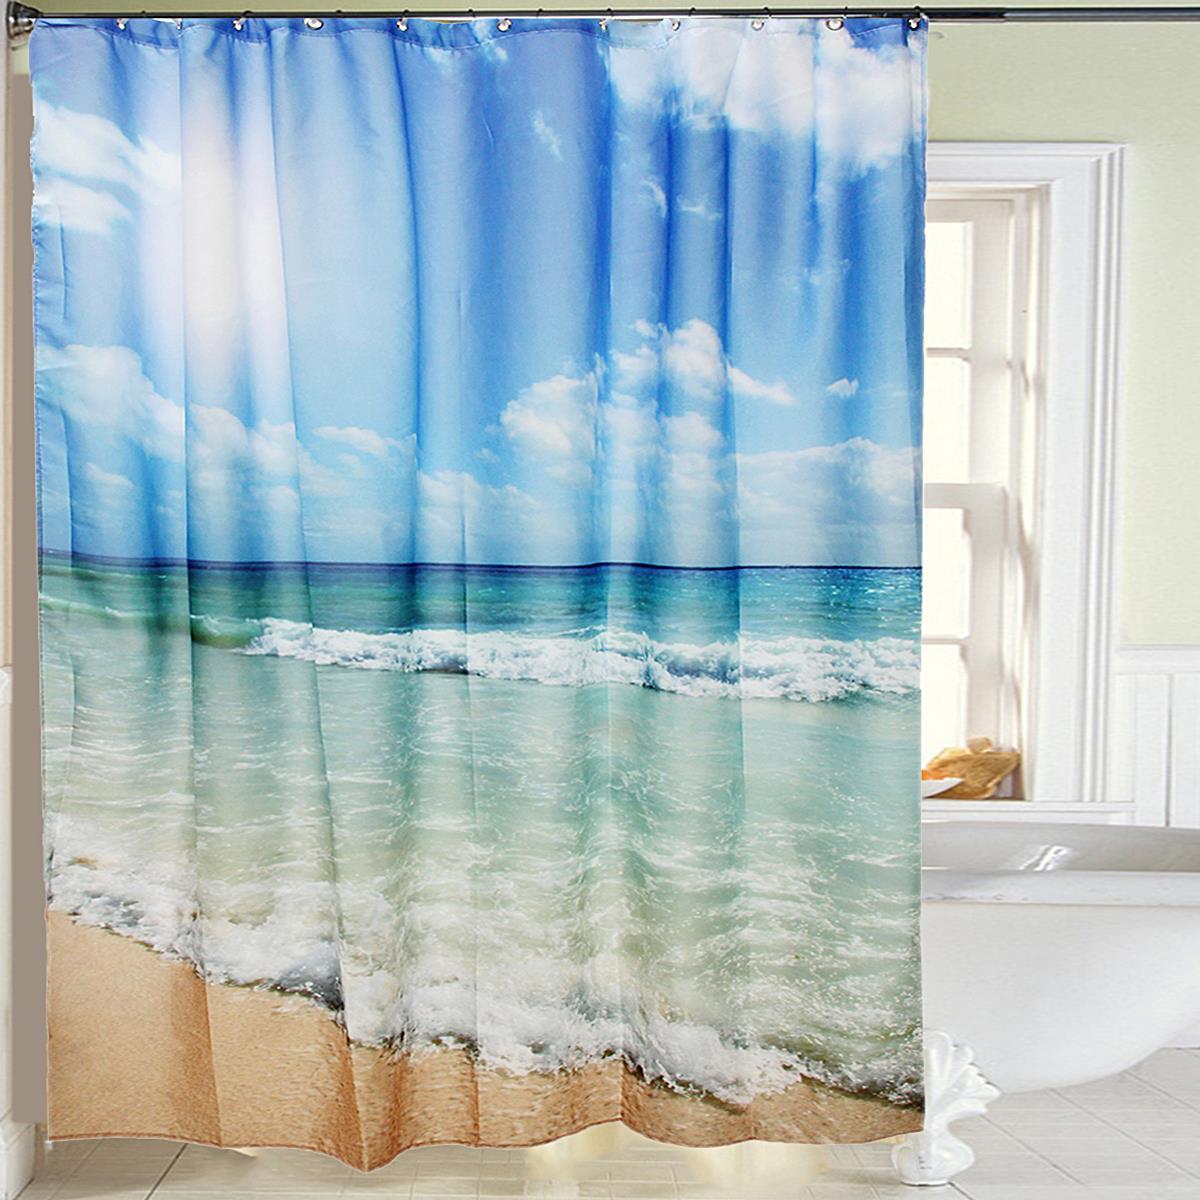 waterproof polyester sea beach shower curtain shower bath screen cover sheer fabric home bathroom decor textiles curtains from home u0026 garden